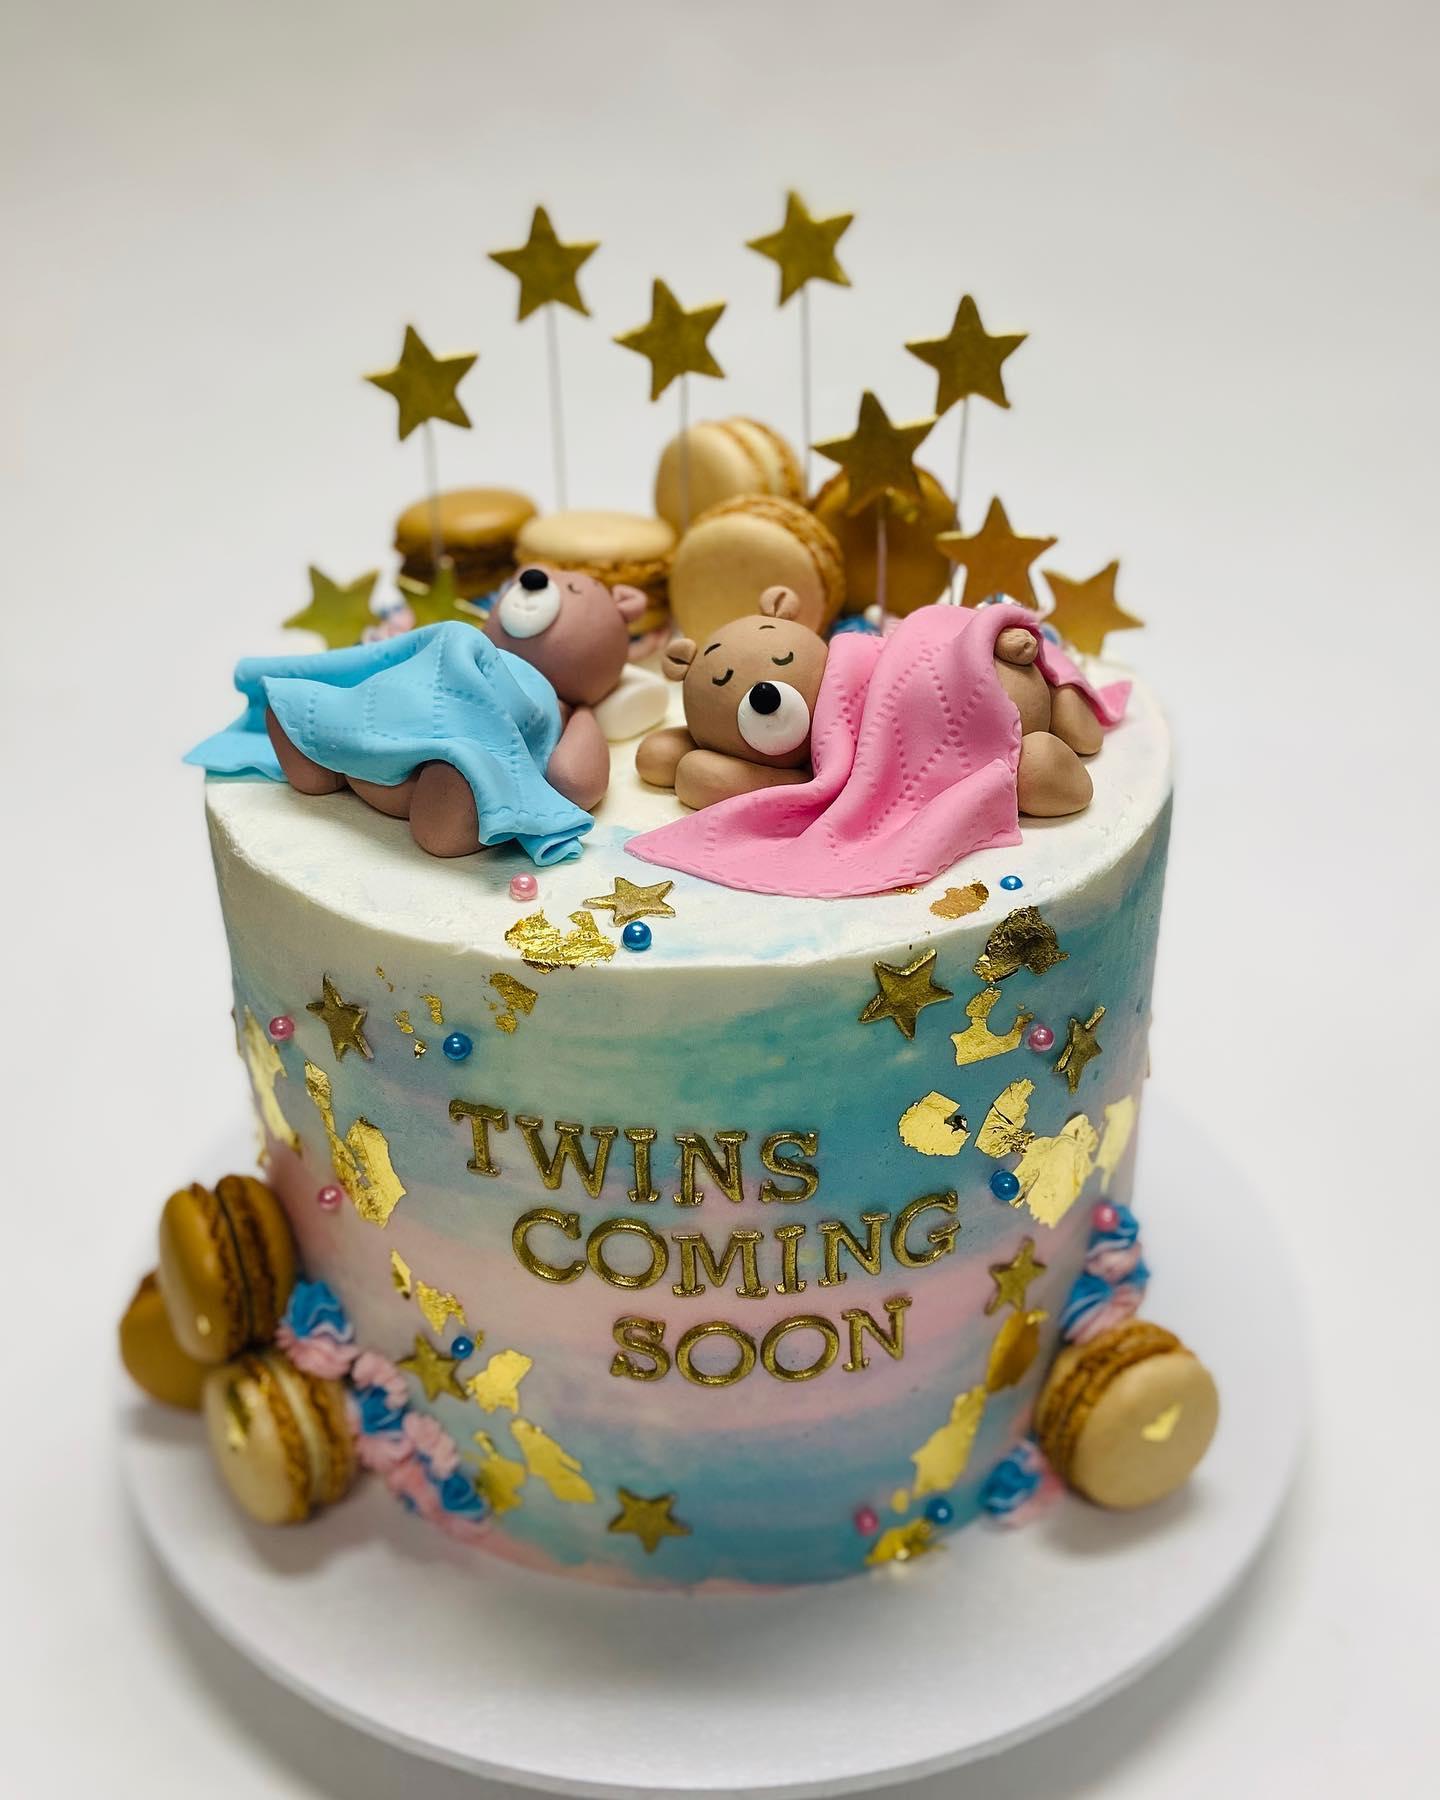 twins coming soon